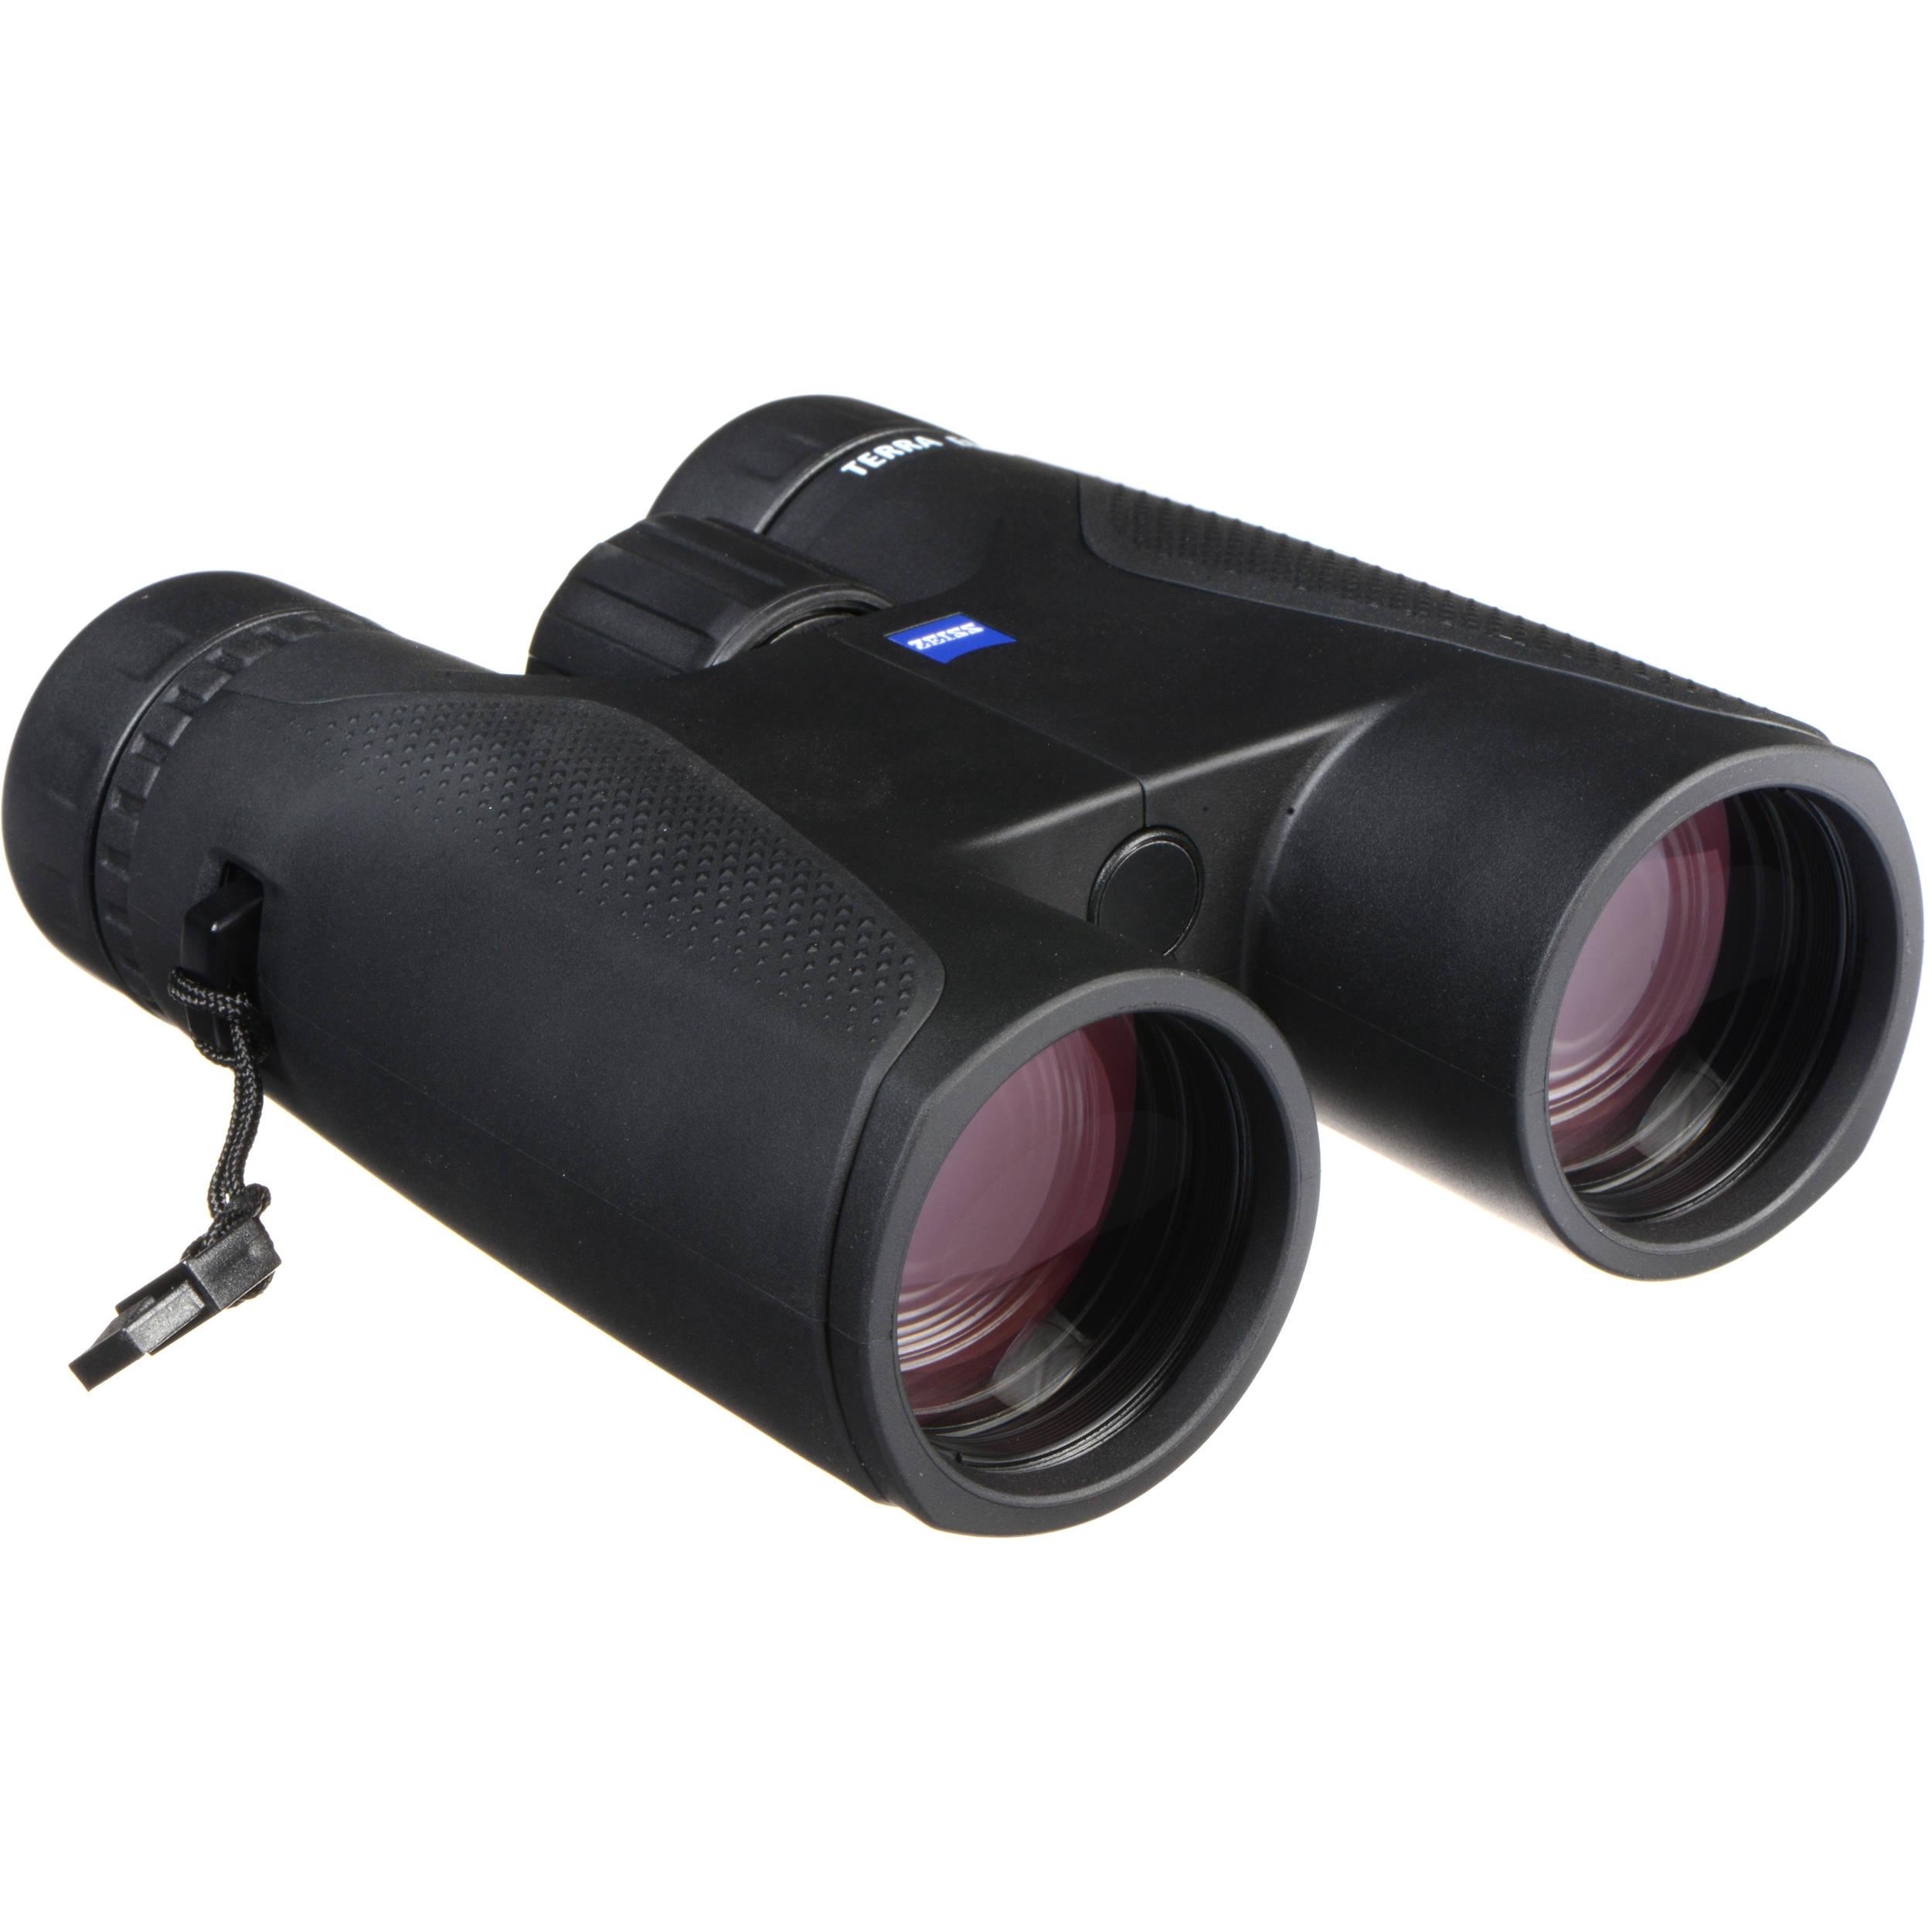 simmons 10x42 binoculars review. zeiss 10x42 terra ed binocular, 2017 edition (black) simmons binoculars review